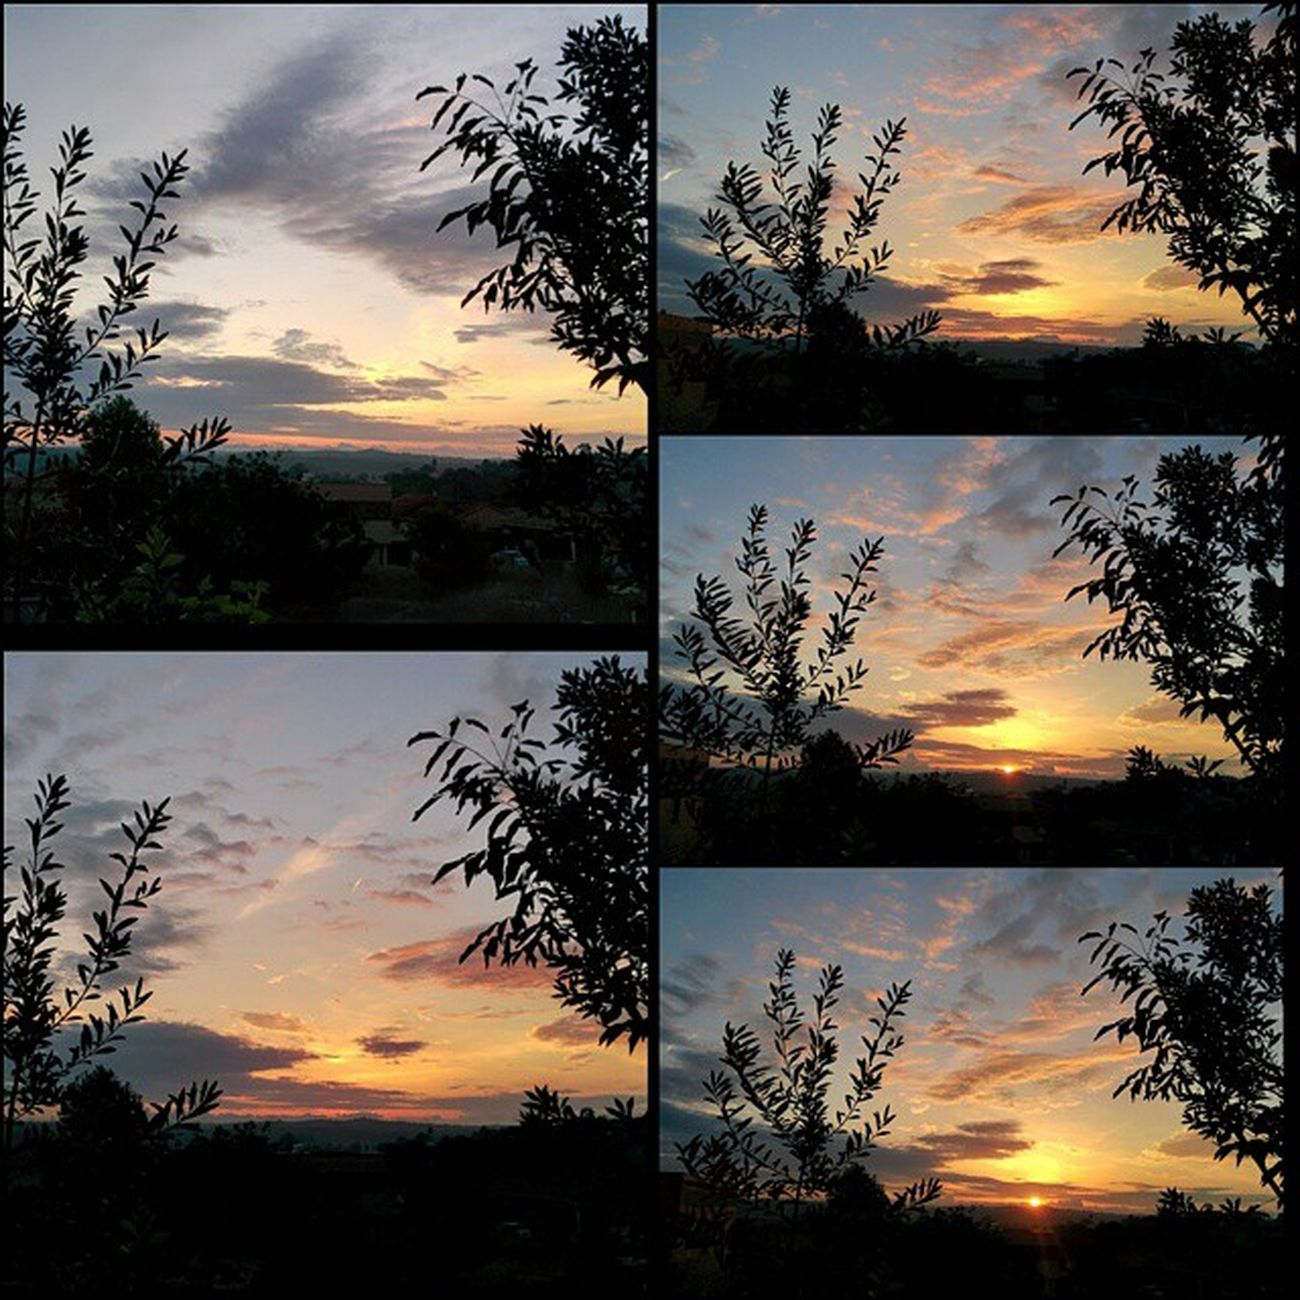 Huomenta! Buenos días! Good morning! 02.oct.2014 Aitoespanja AAMU Amanecer Morning Spain